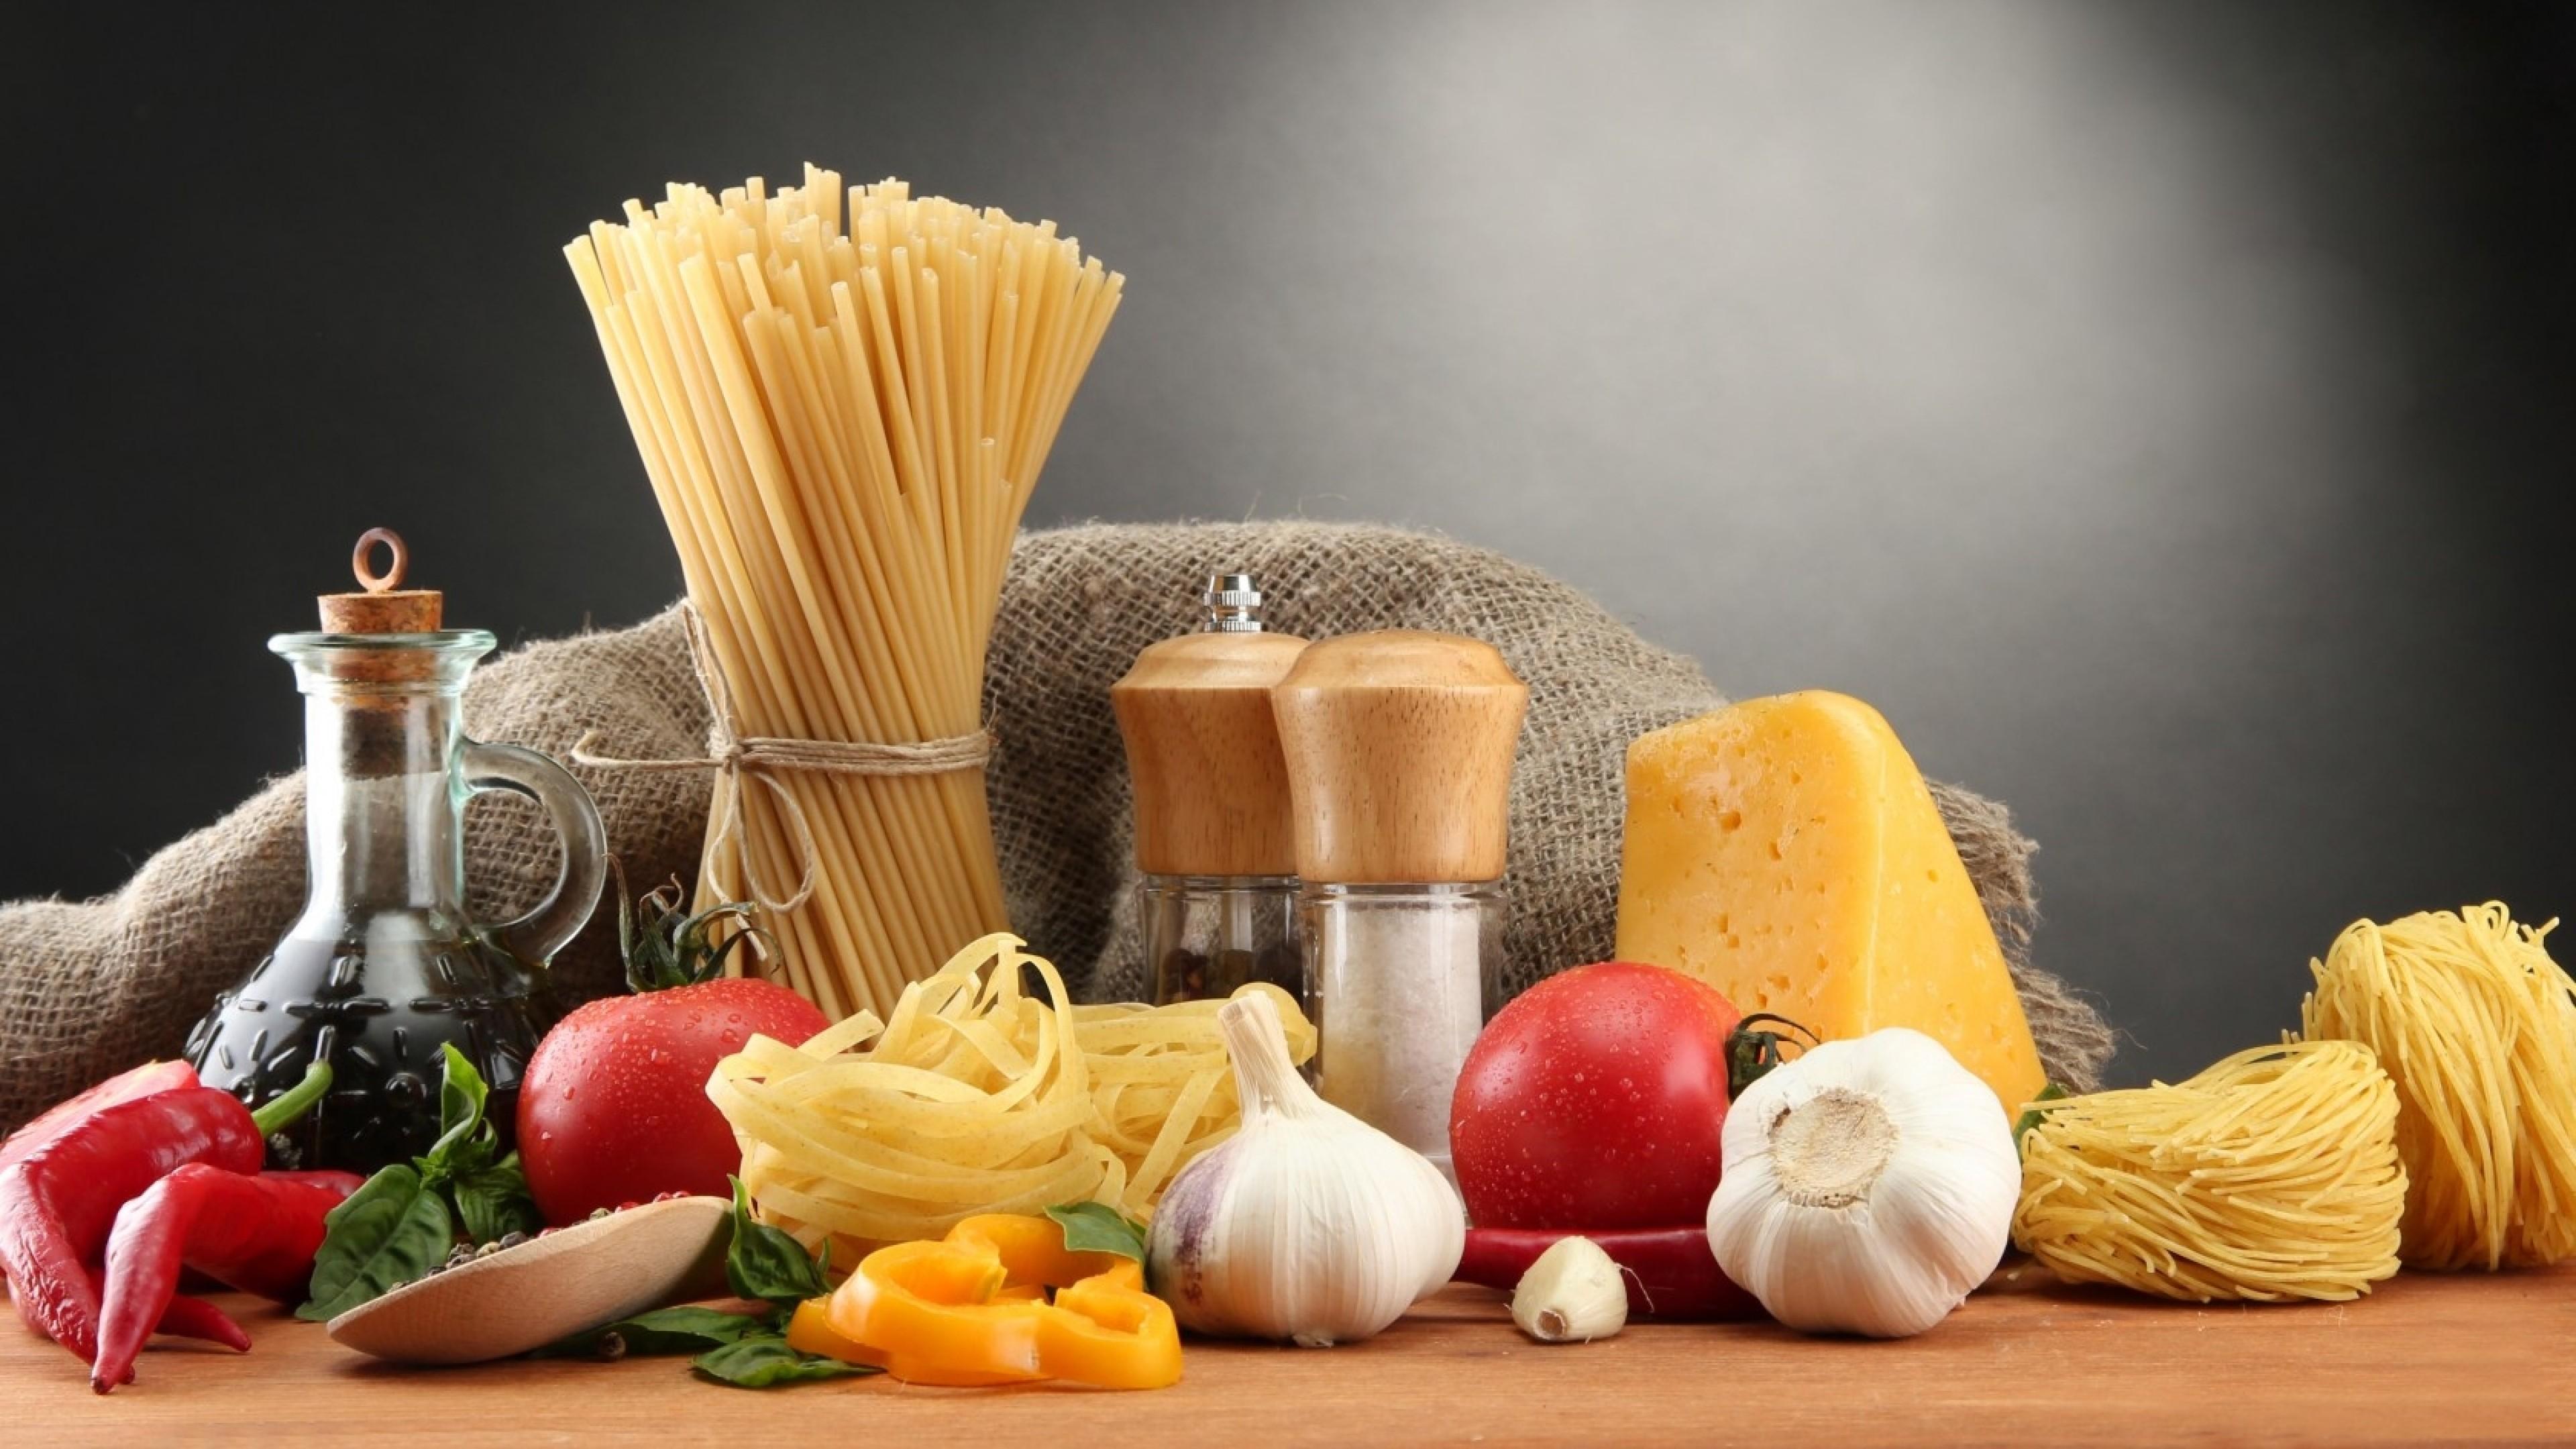 Wallpaper cheese, pepper, chili, garlic, pasta, noodles, salt,